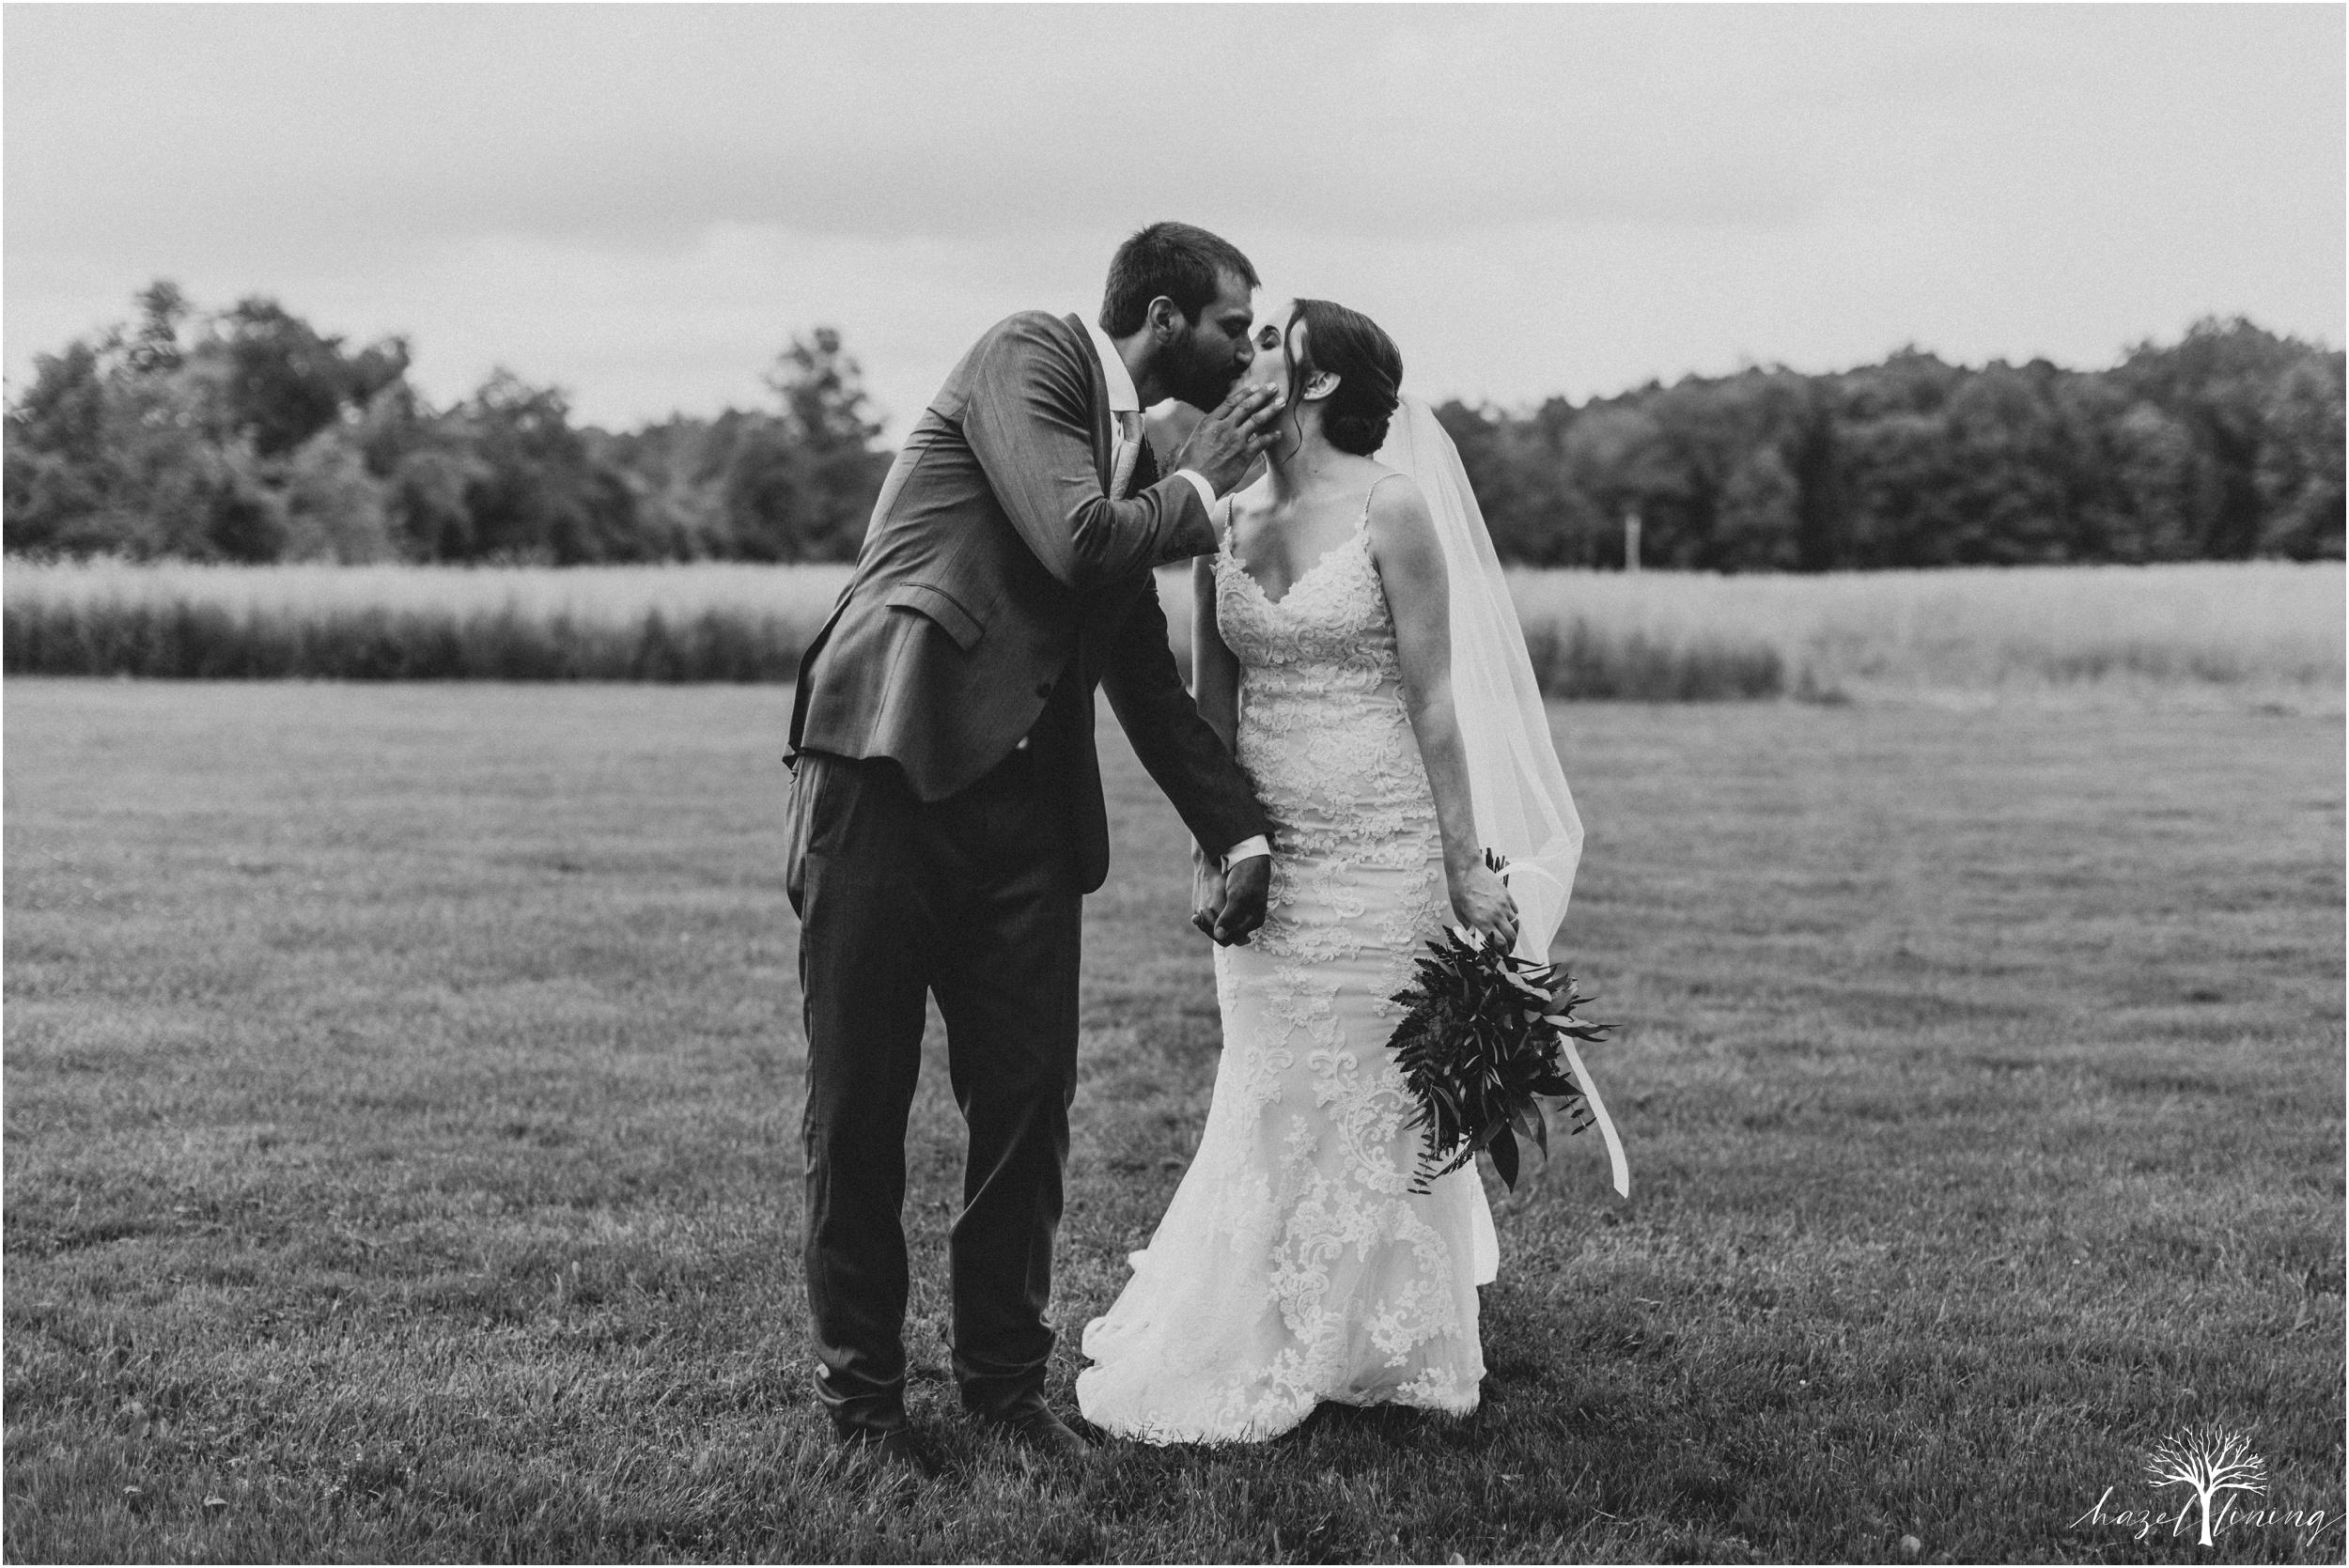 hazel-lining-travel-wedding-elopement-photography-lisa-landon-shoemaker-the-farm-bakery-and-events-bucks-county-quakertown-pennsylvania-summer-country-outdoor-farm-wedding_0095.jpg